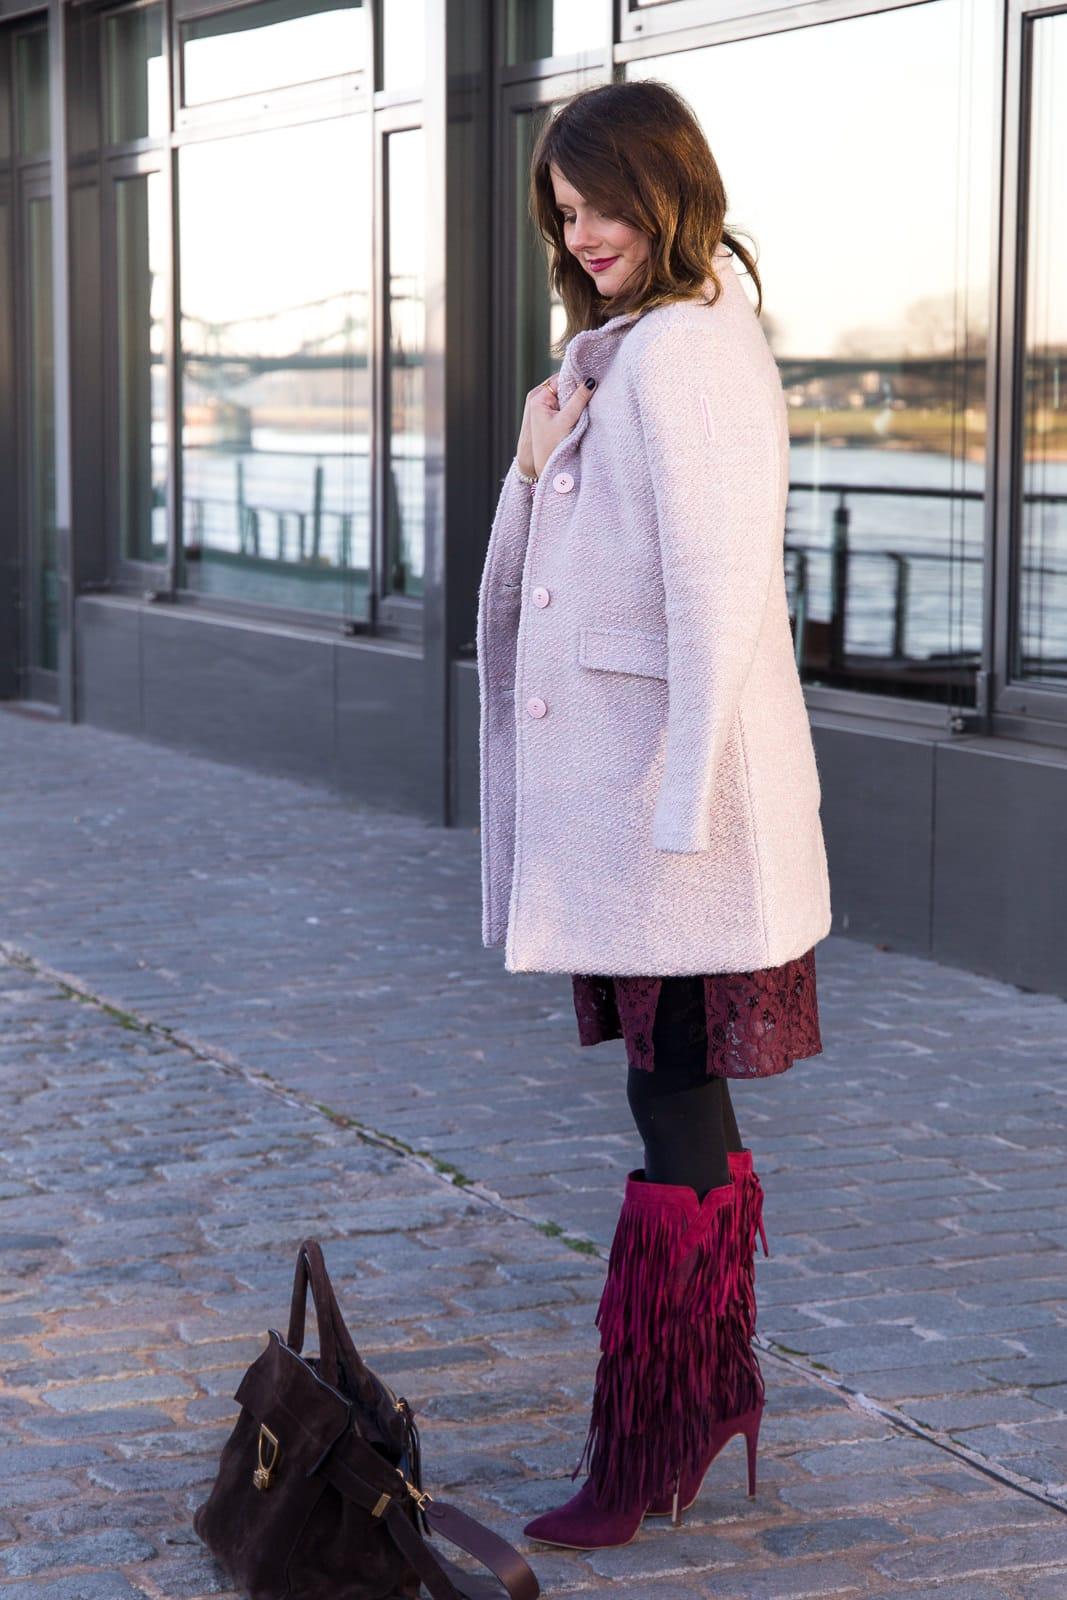 Rosa trifft Bordeaux: Fransen Boots & Spitzenkleid in Midi-Länge